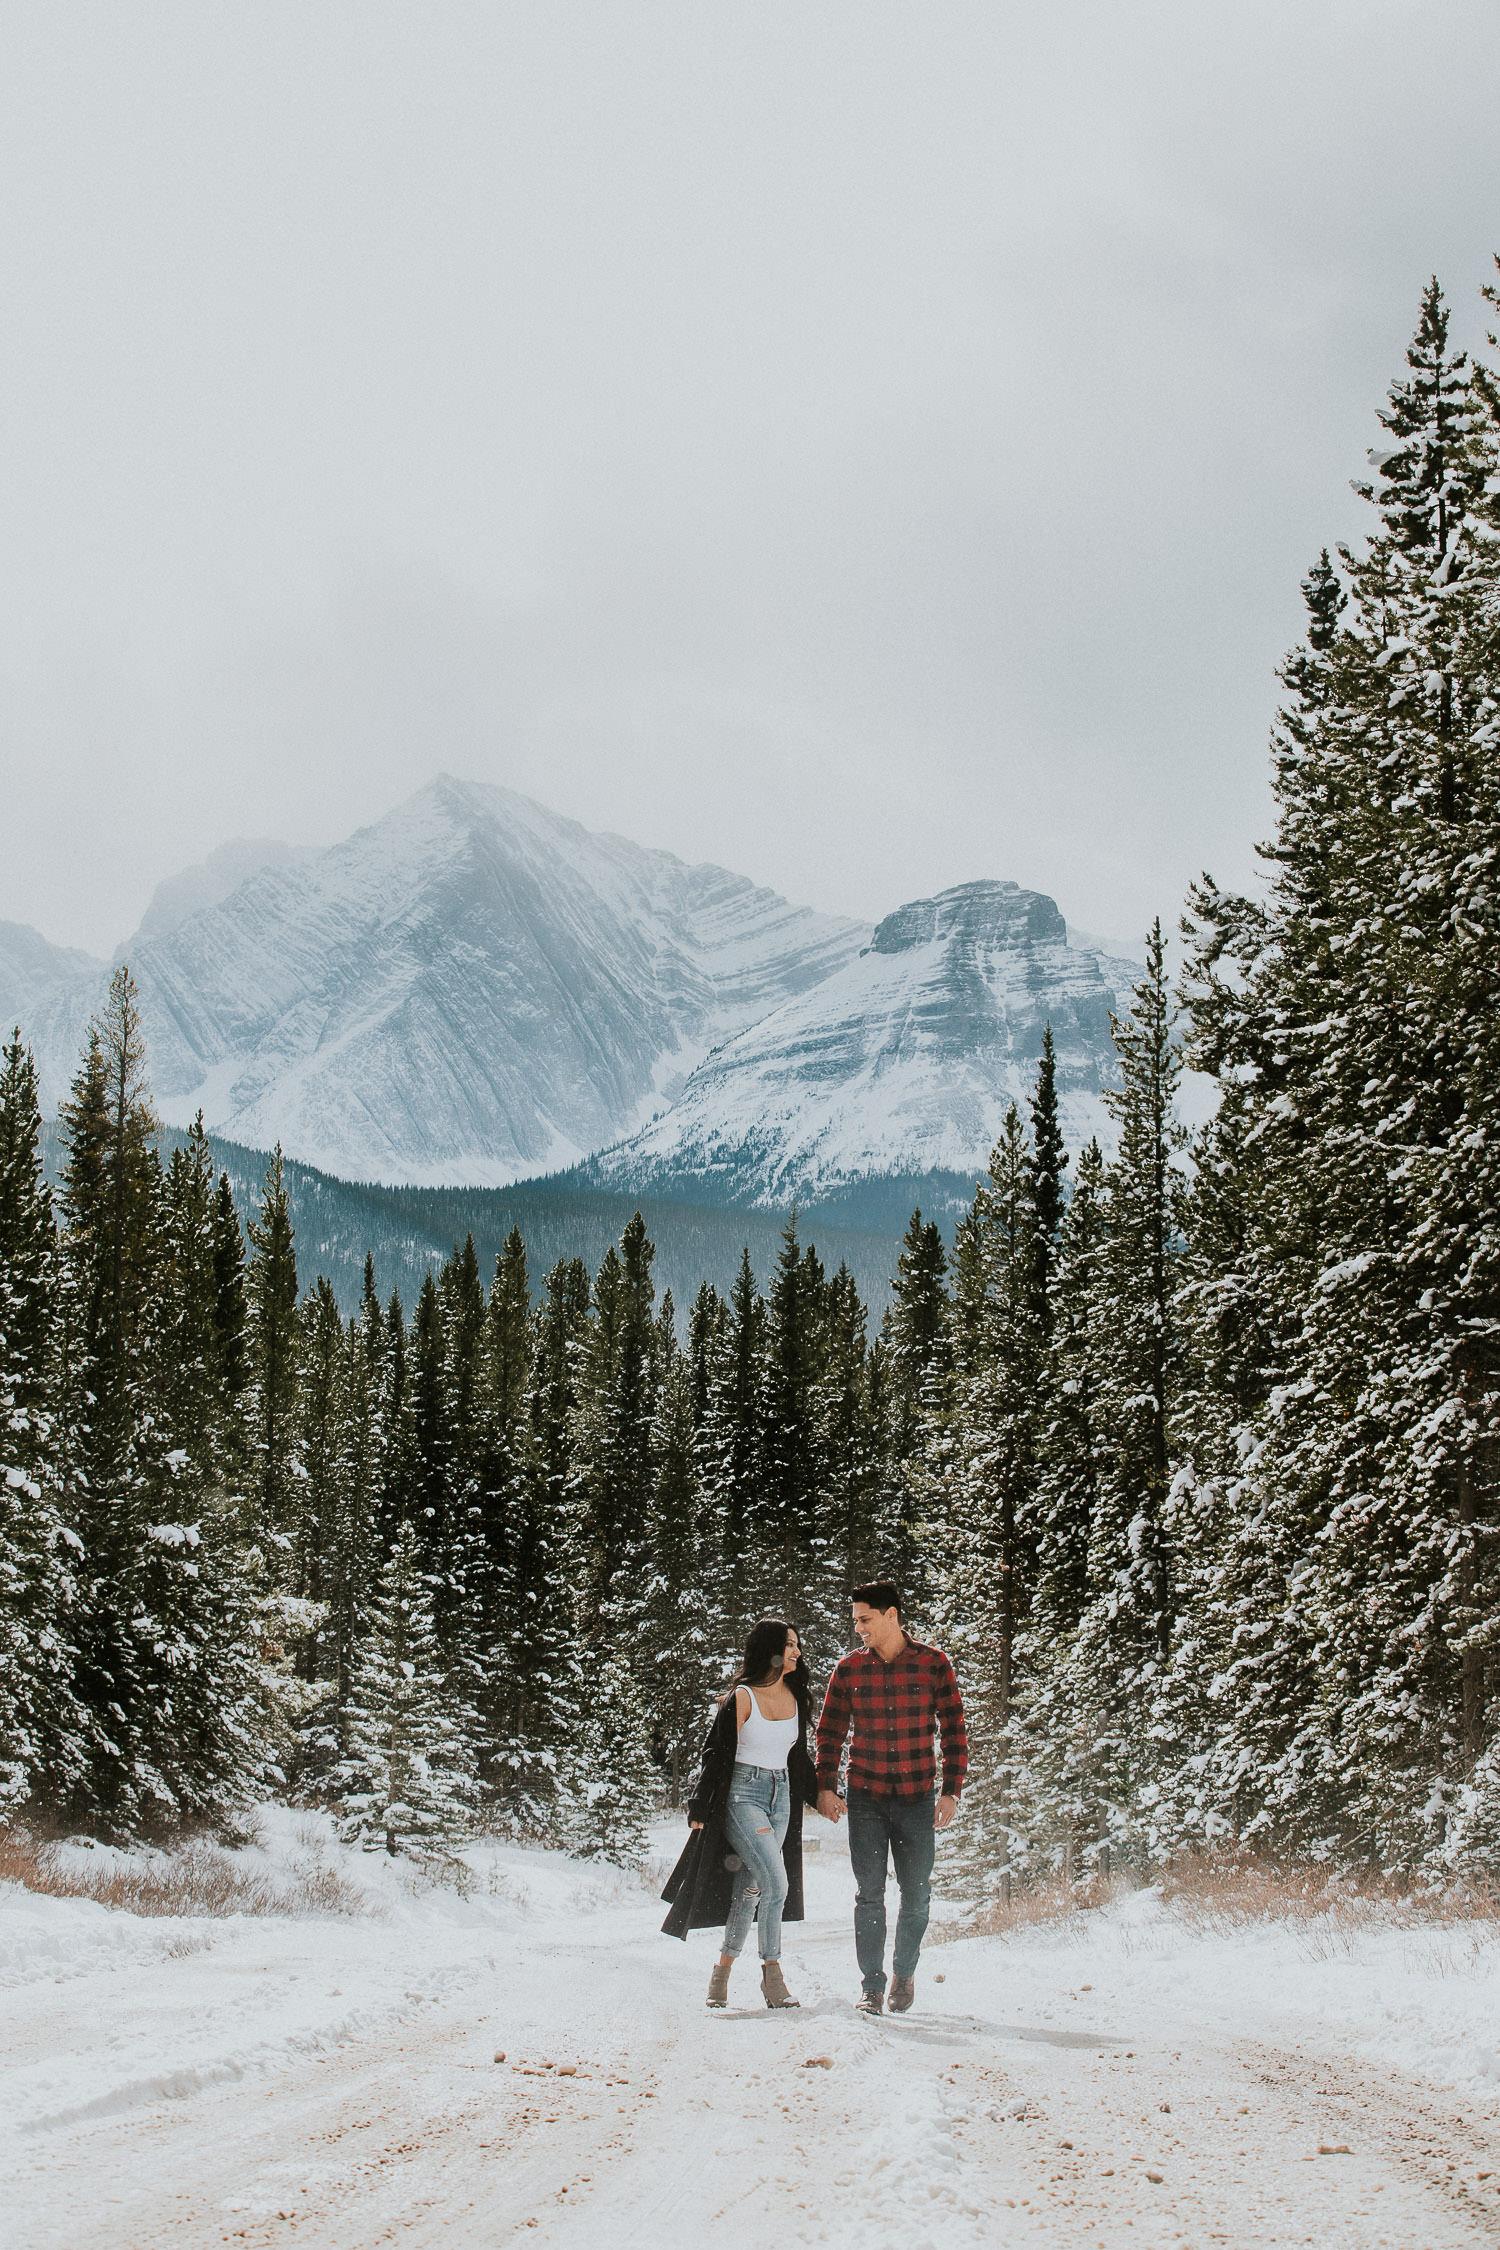 chilly Kananaskis Winter Engagement Photos - Sarah pukin